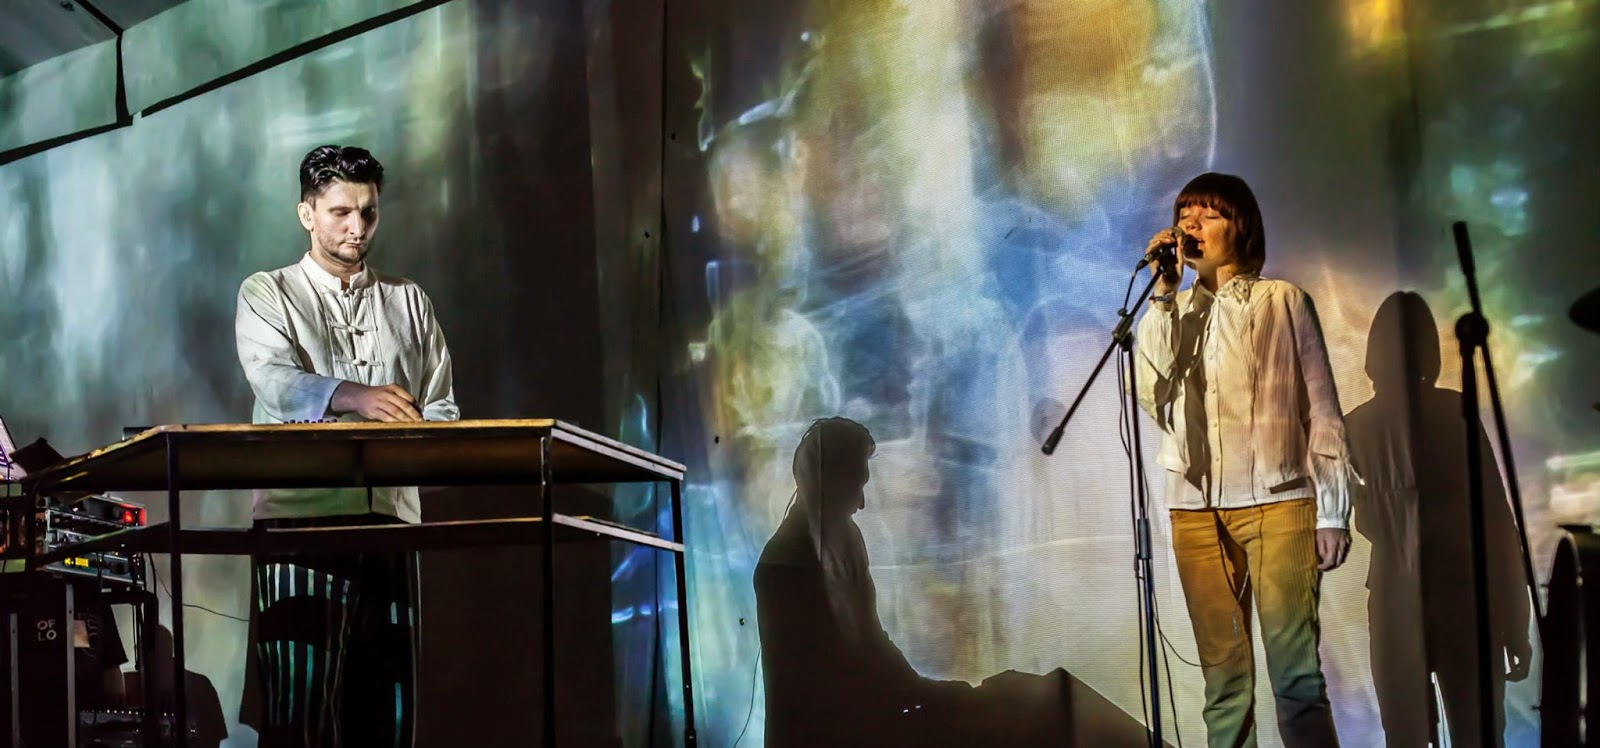 Thy Veils live at Sziget Festival 2014 - Daniel Dorobantu & Manuela Marchis